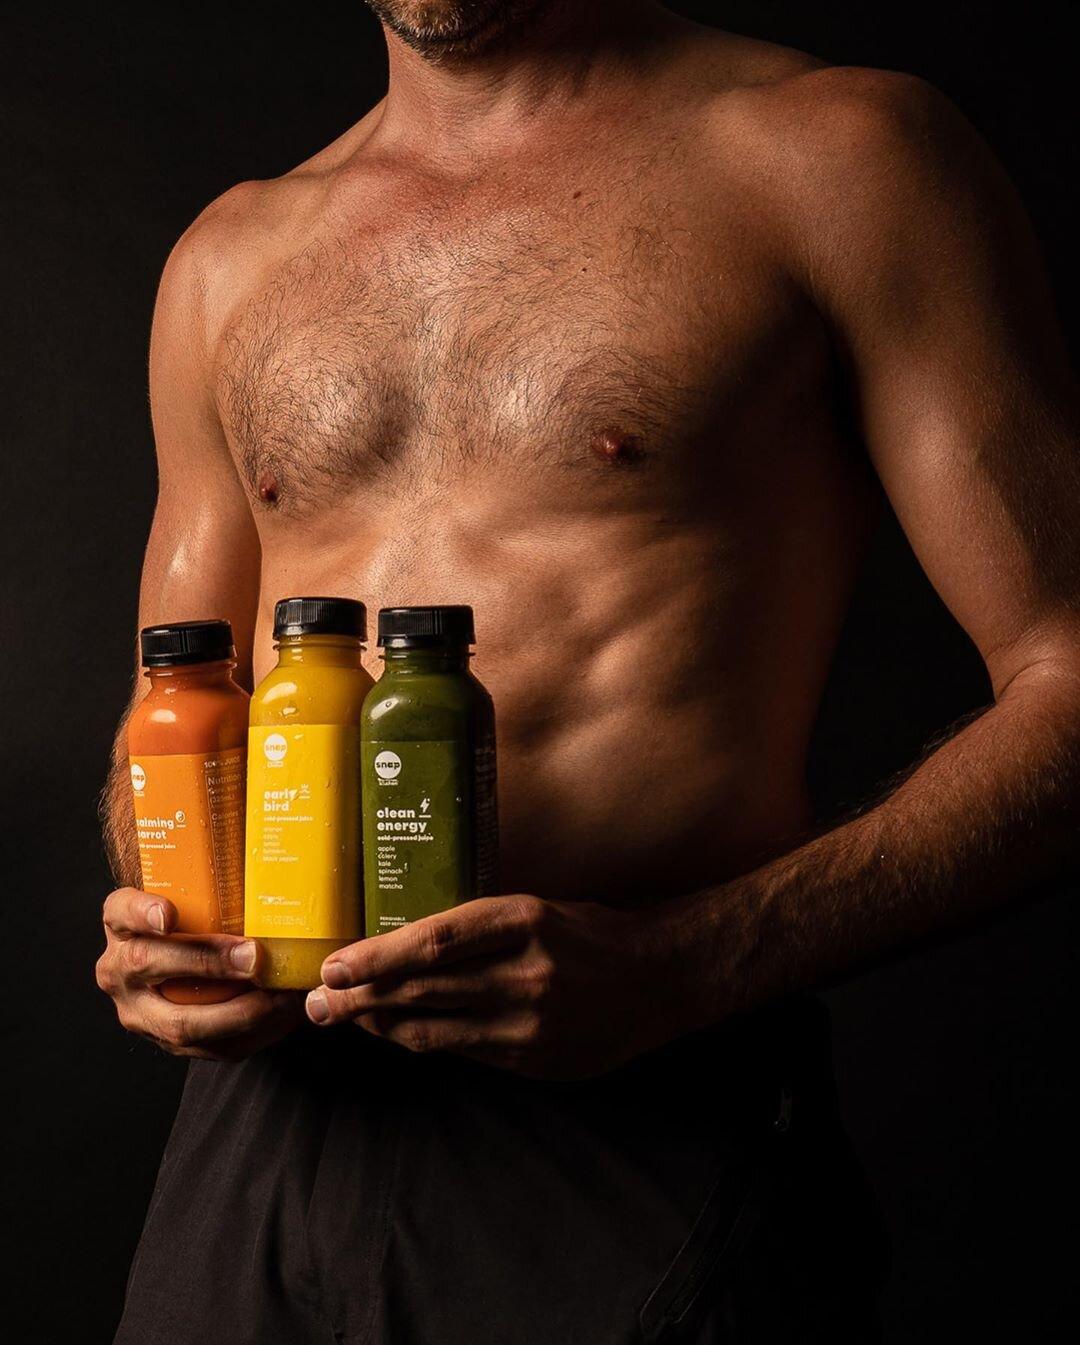 snap kitchen juice by weston carls photography.jpg